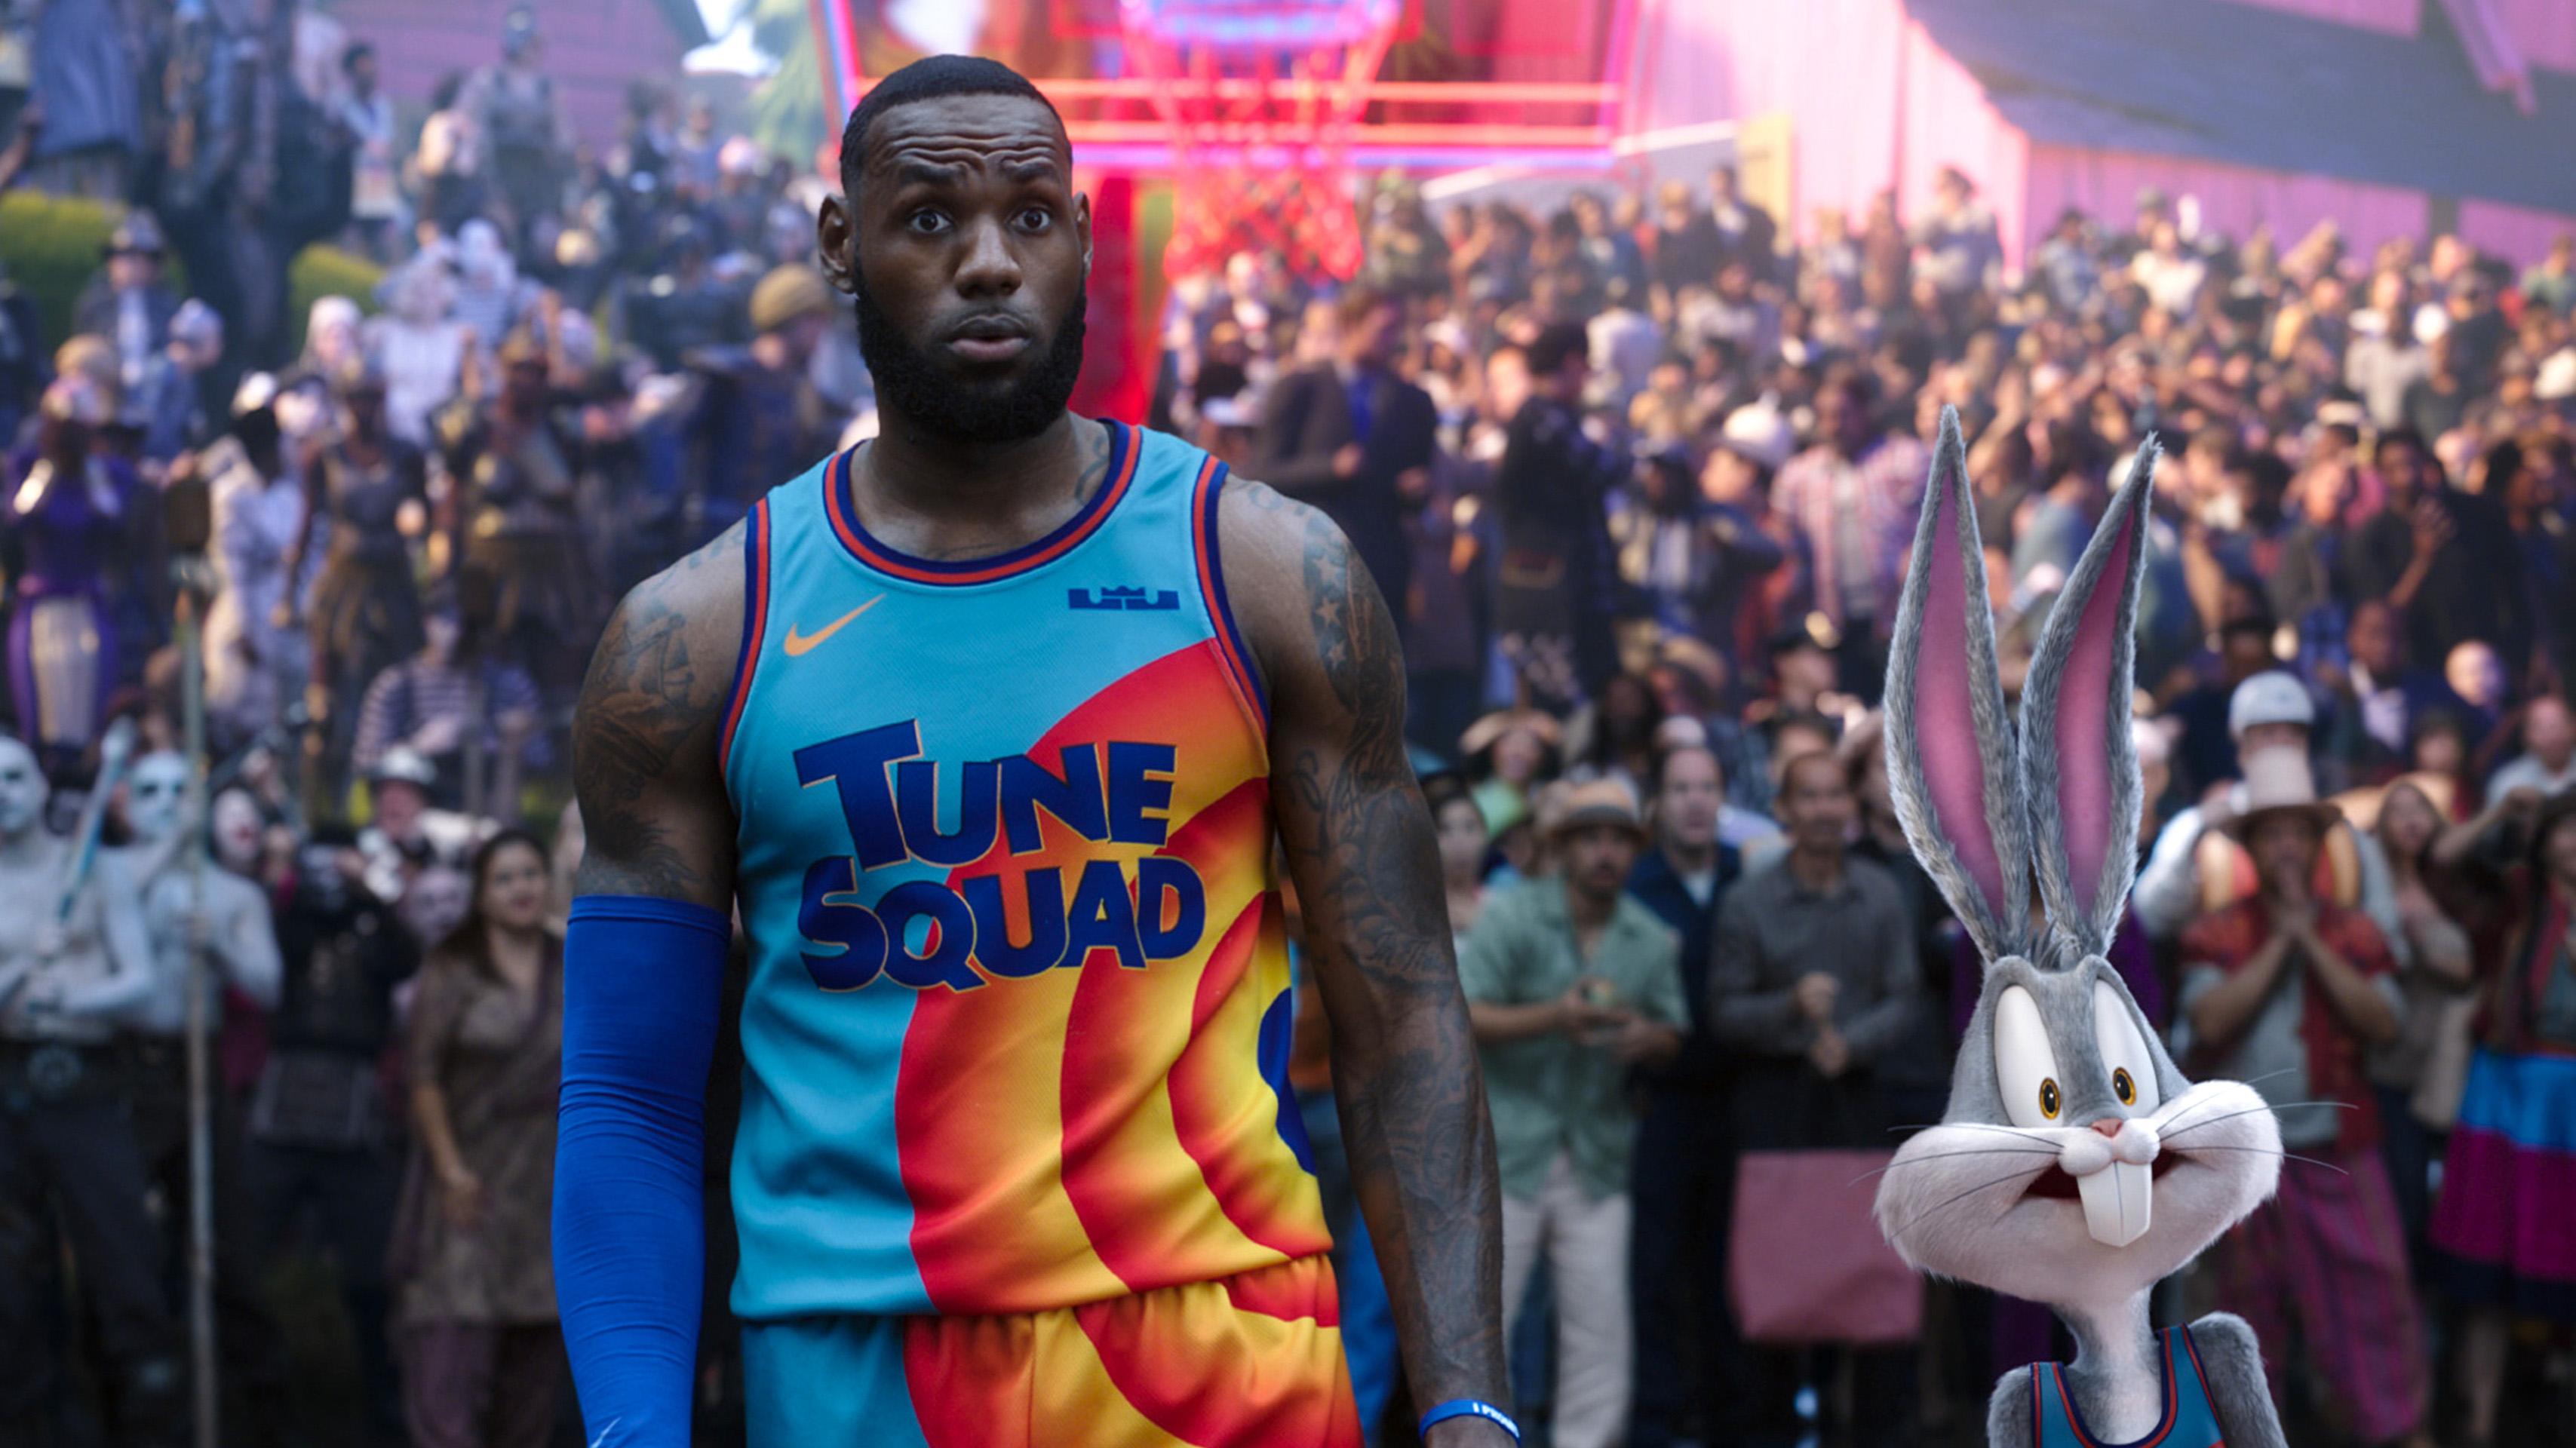 Space Jam, nueva era, Looney Tunes, LeBron, LeBron James, Bugs Bunny